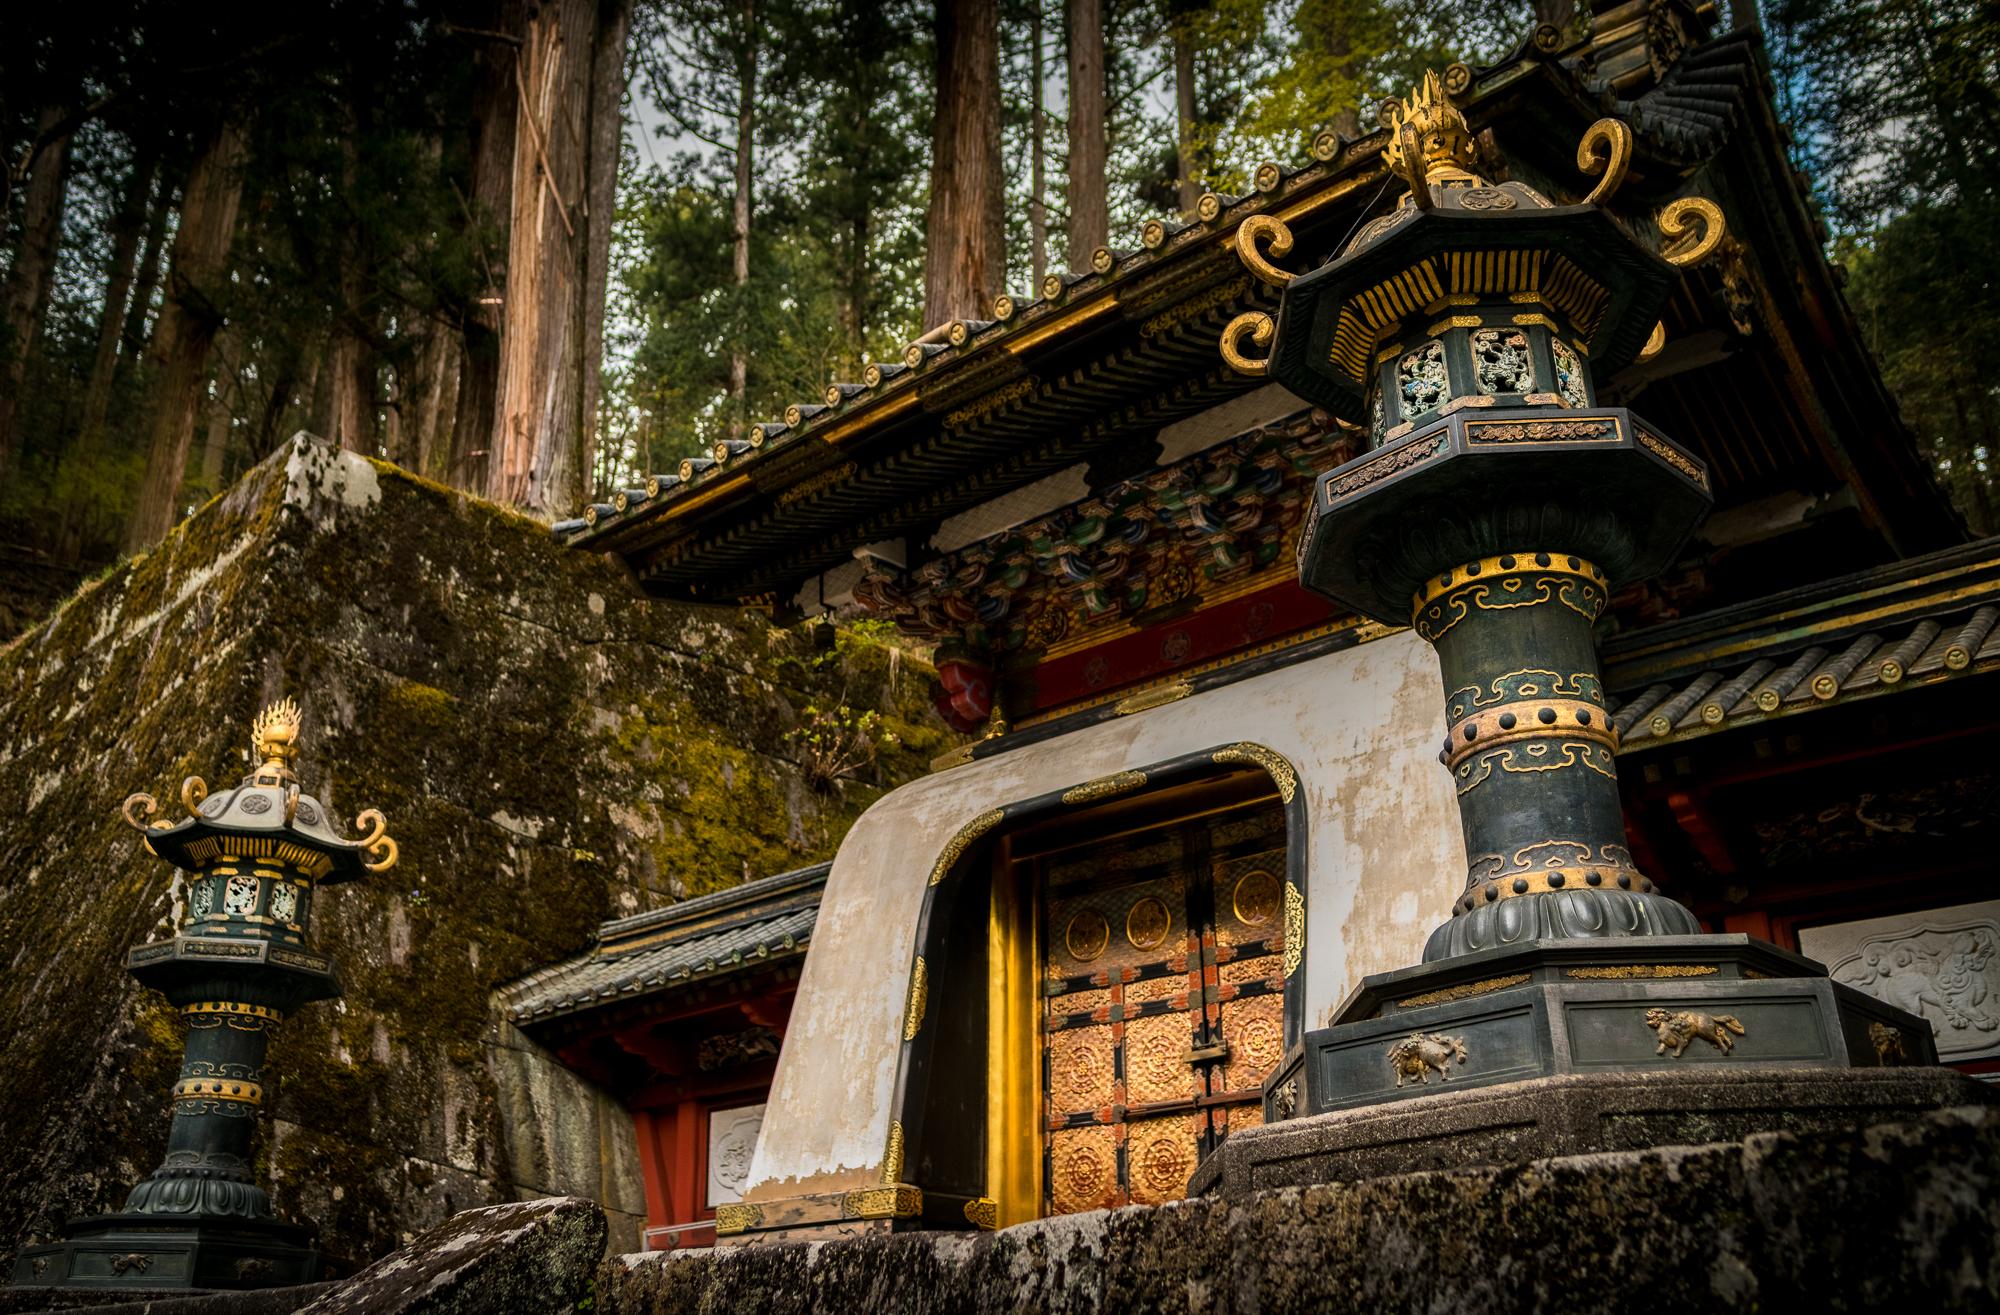 Het Lemitsu Mausoleum Het Lemitsu Mausoleum